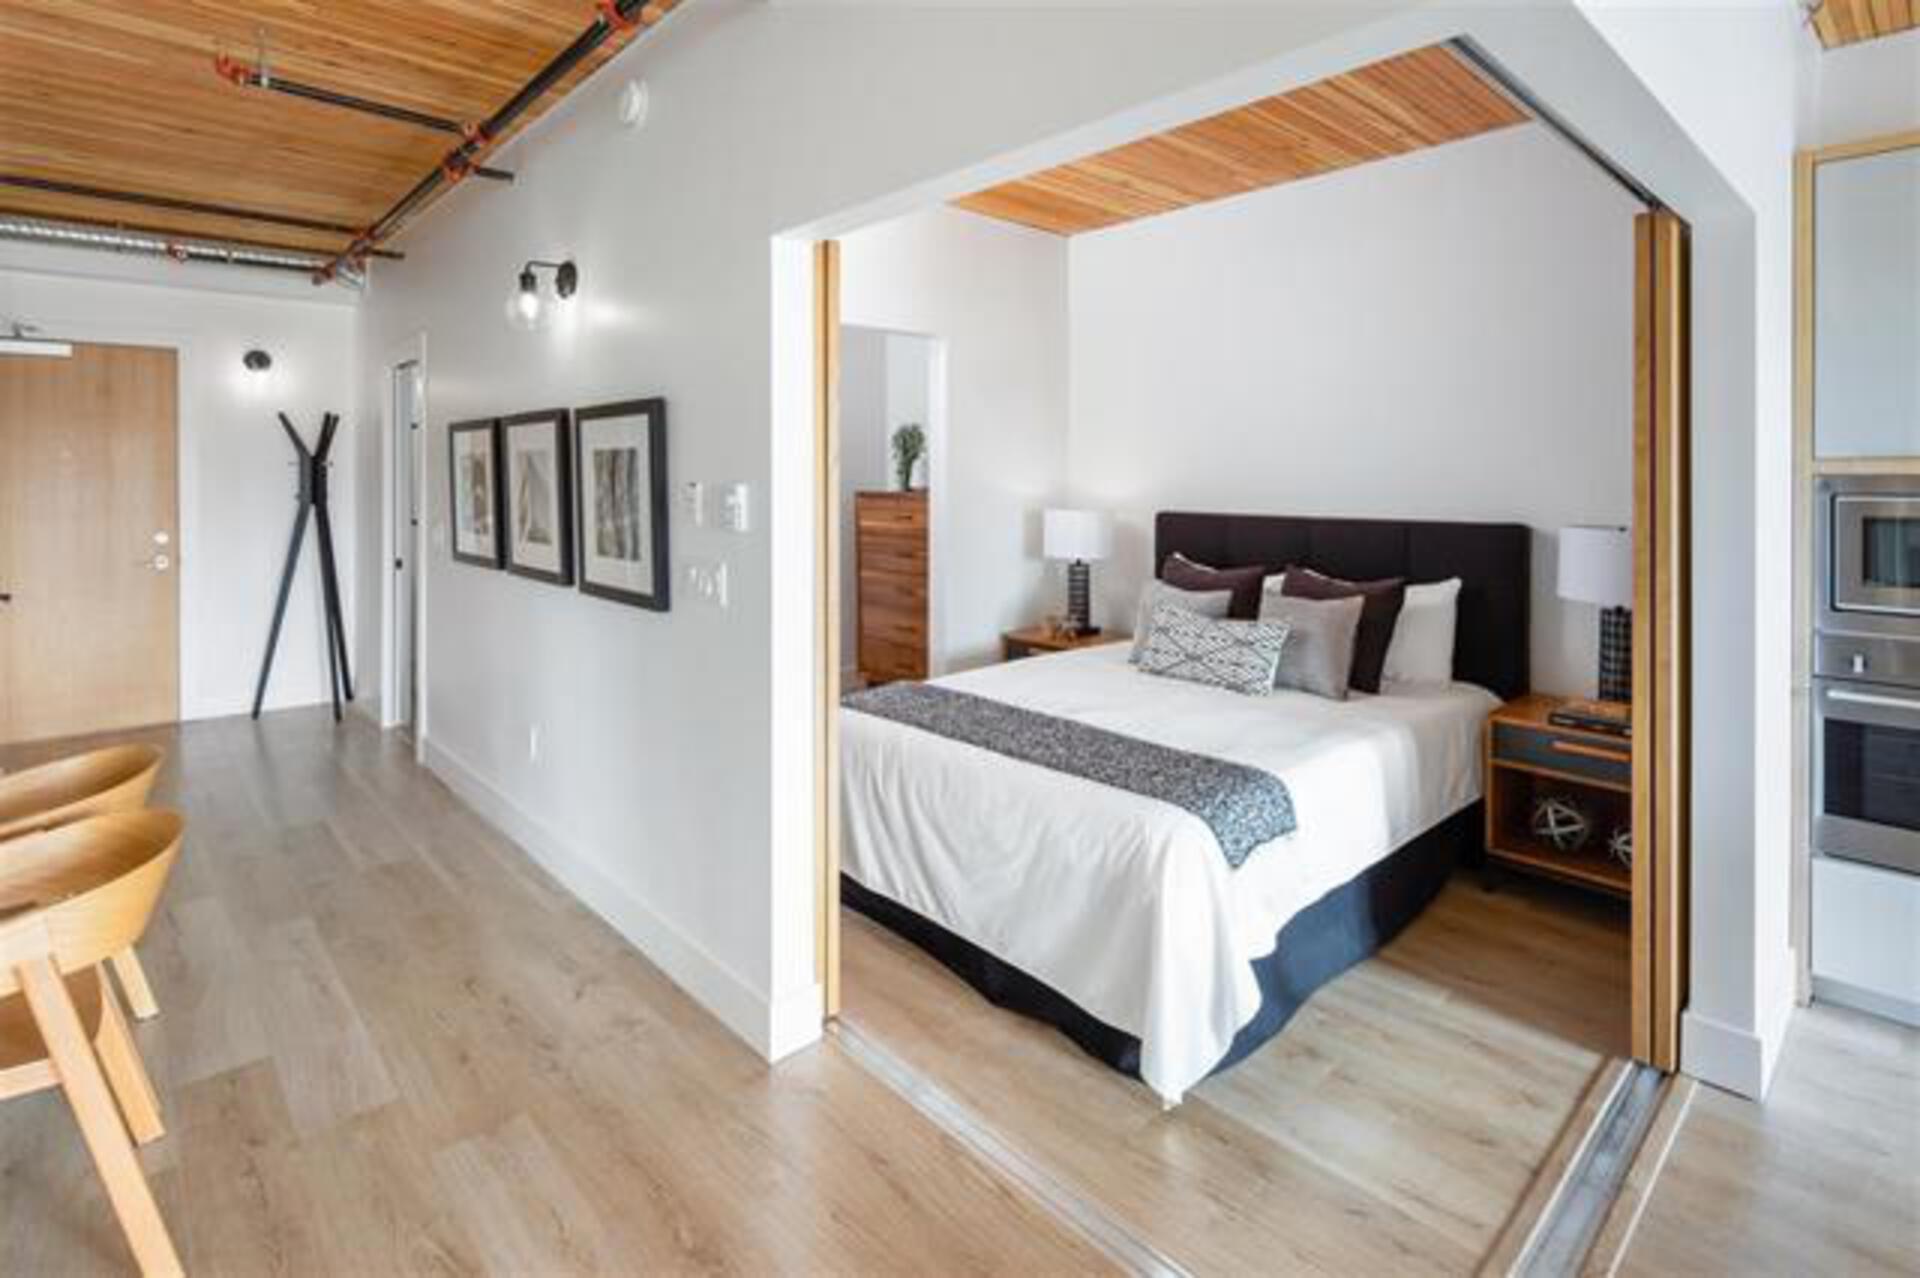 4223hastings2 at 207 - 4223 Hastings Street, Vancouver Heights, Burnaby North